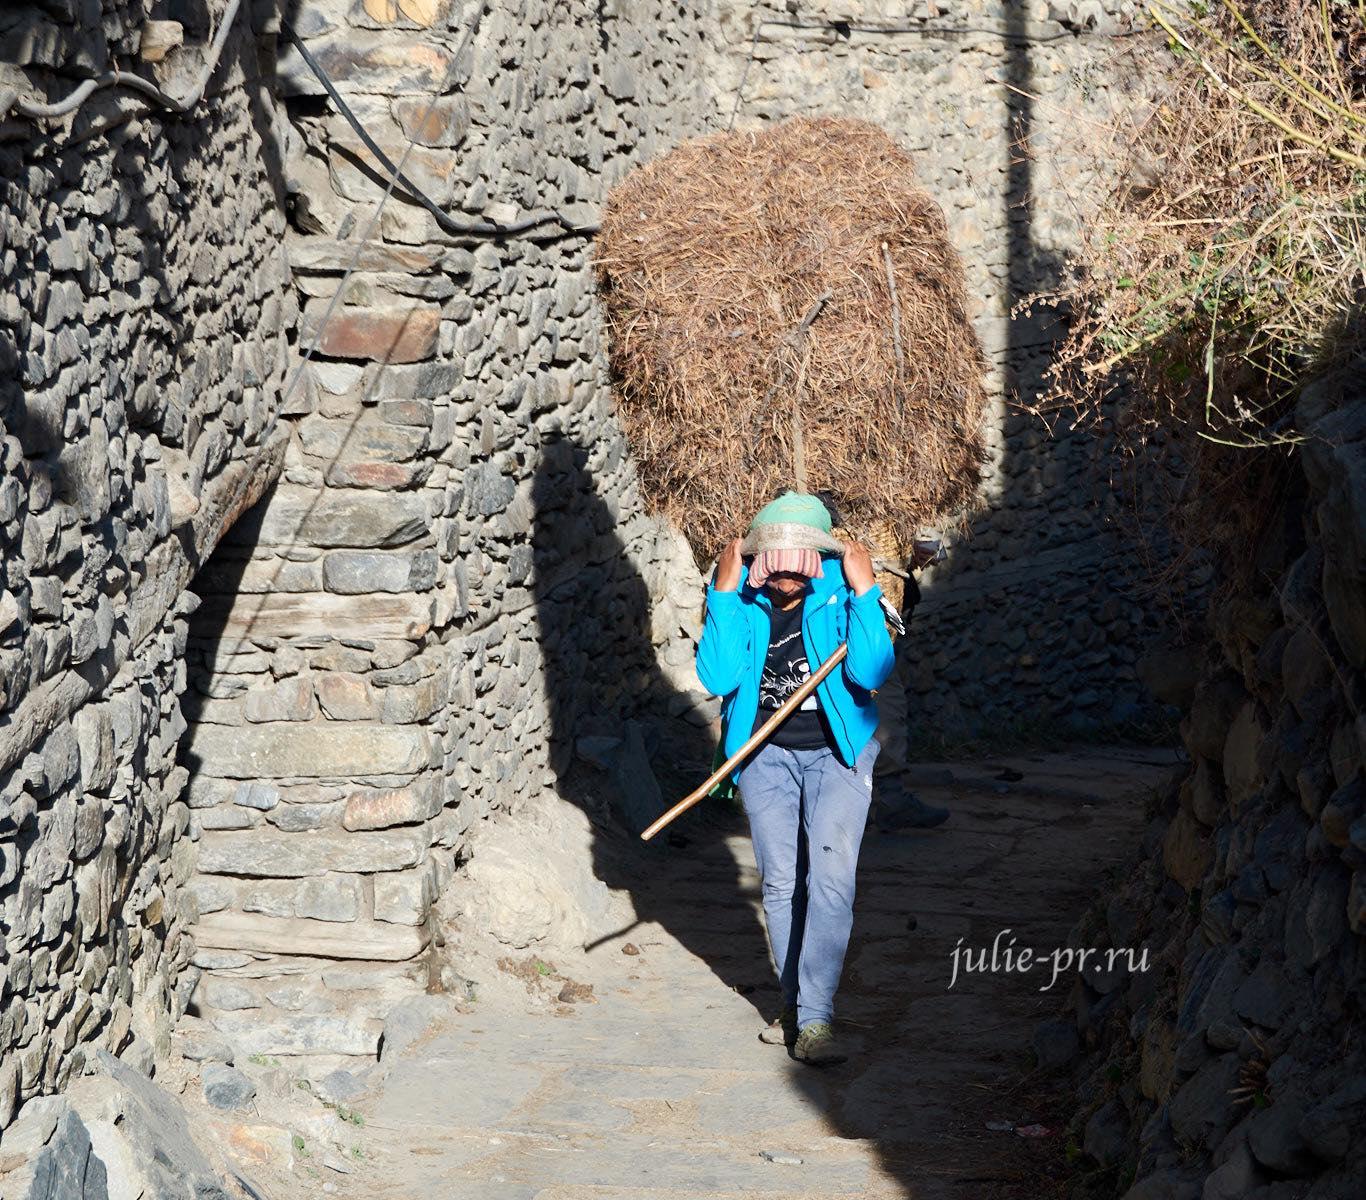 Деревня Мананг, крестьянин